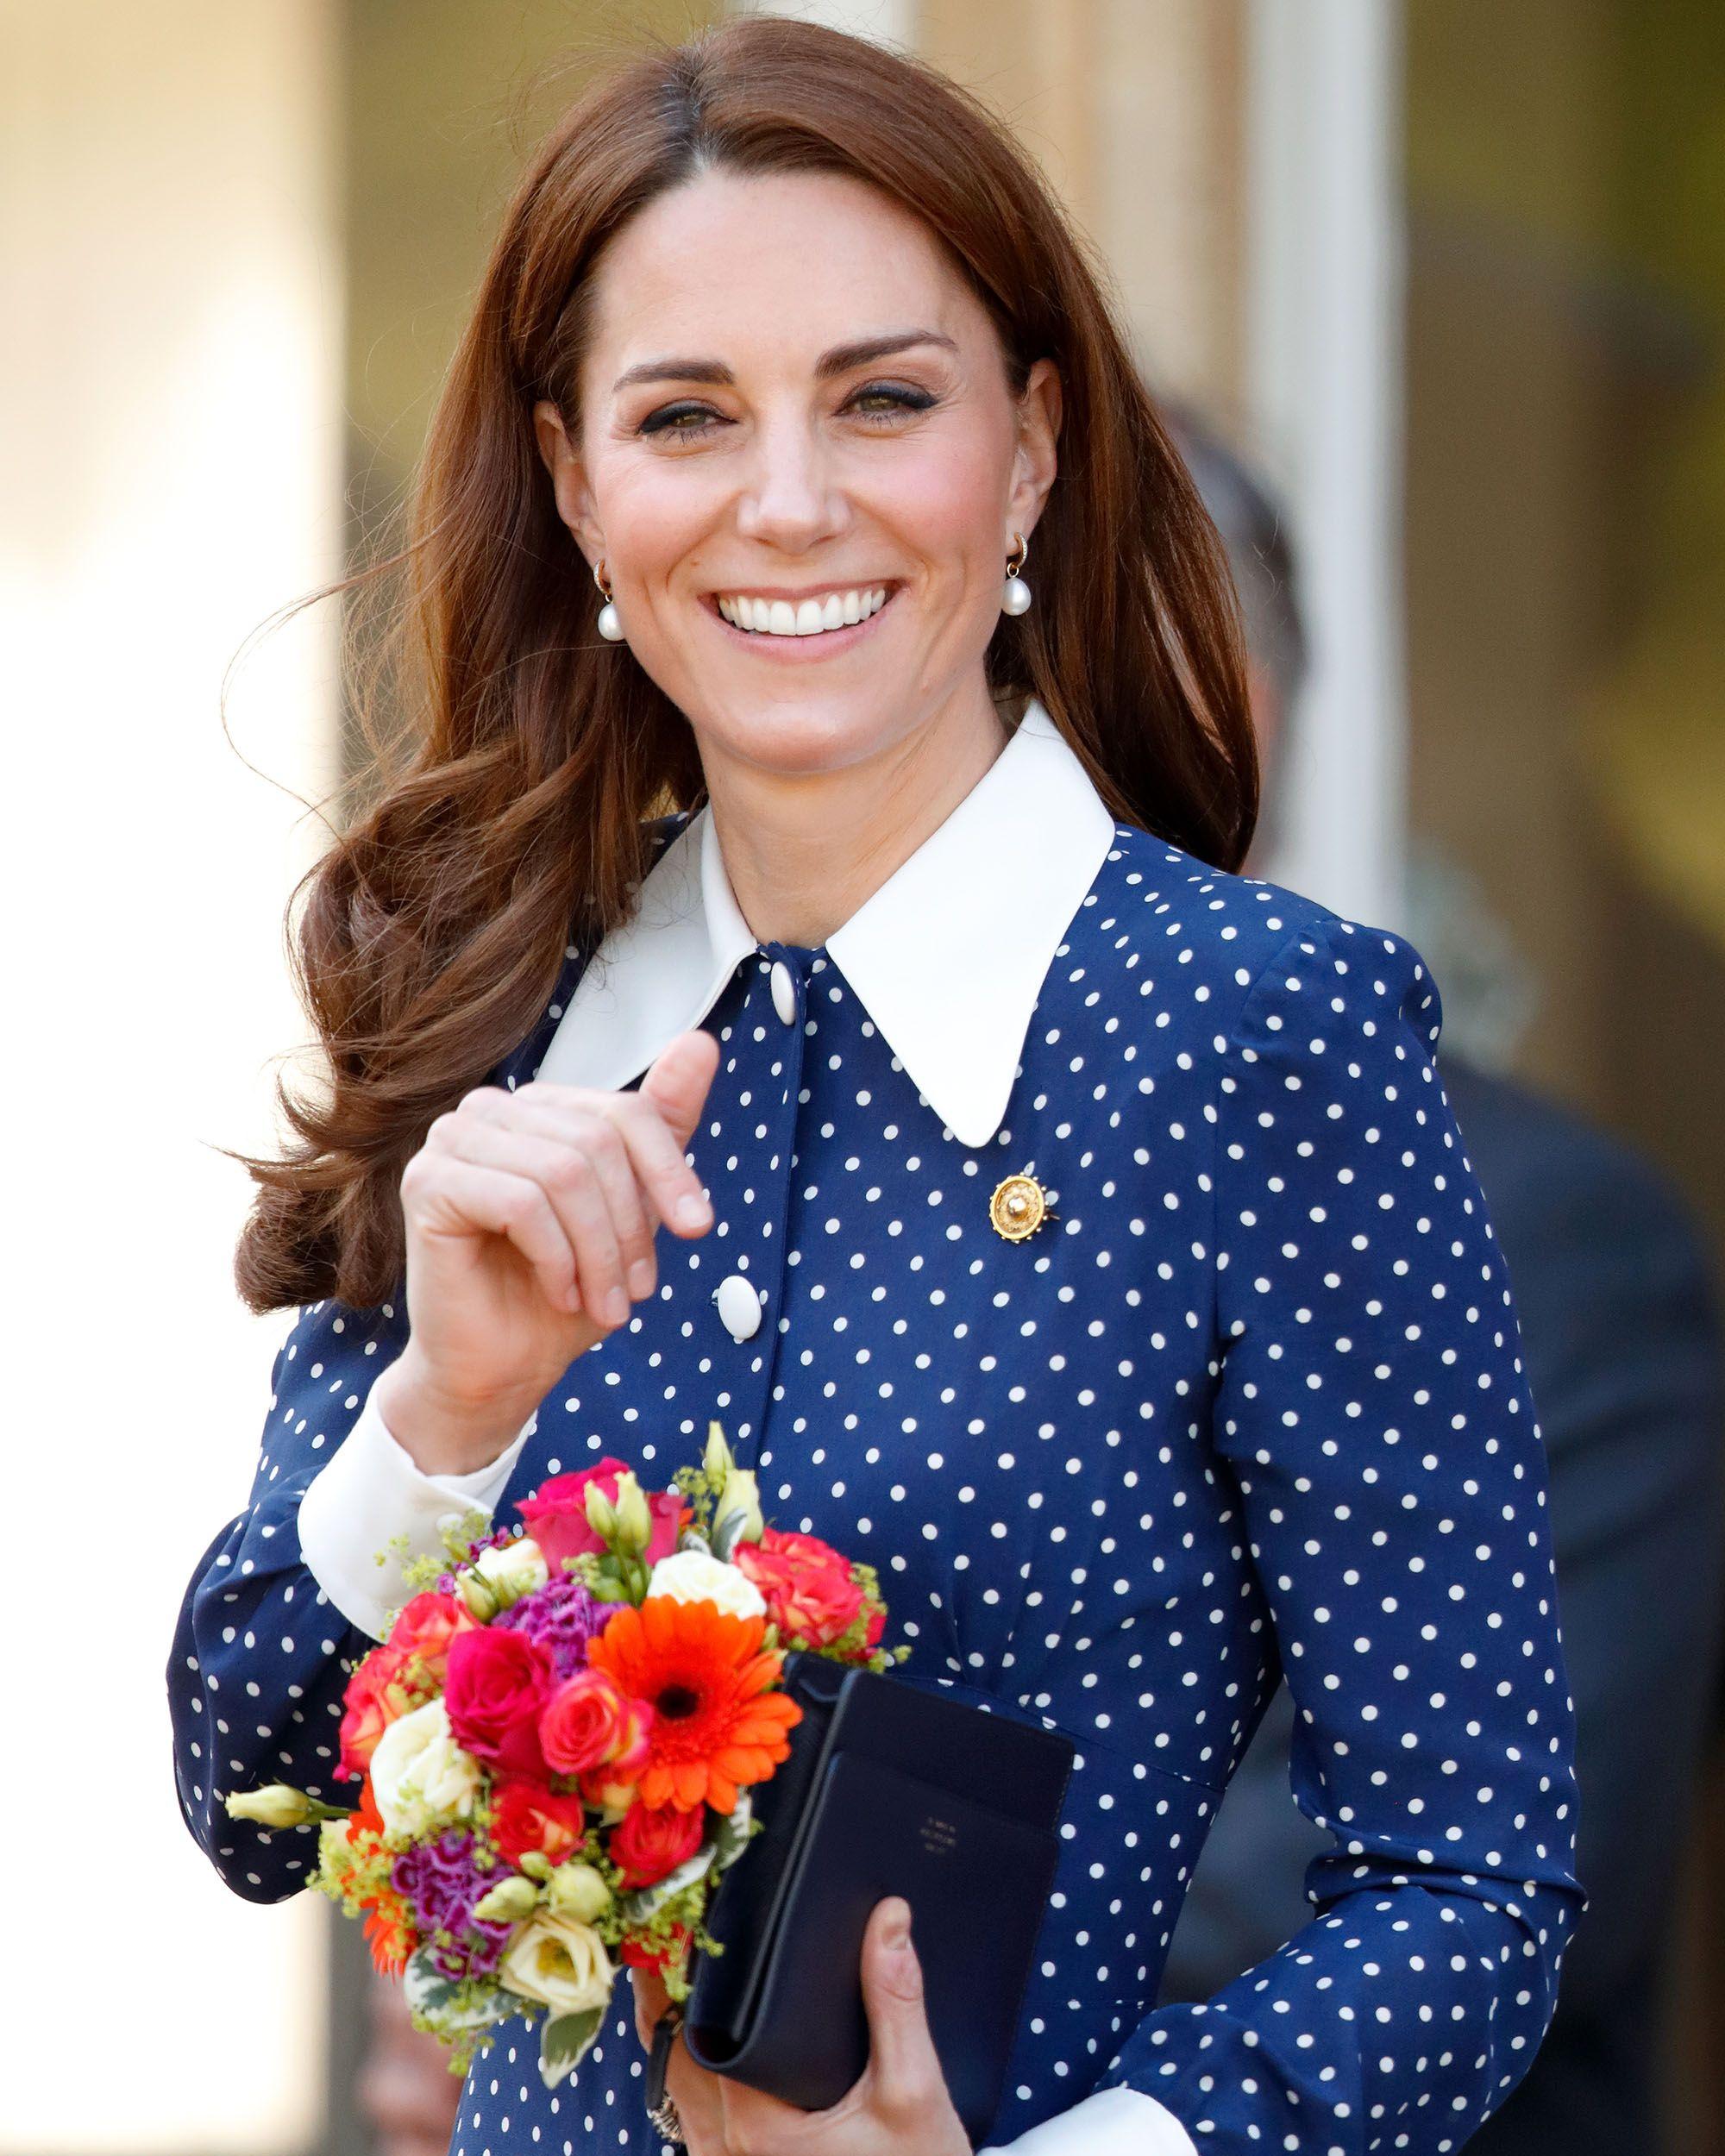 The Duchess of Cambridge starts book treasure hunt in London